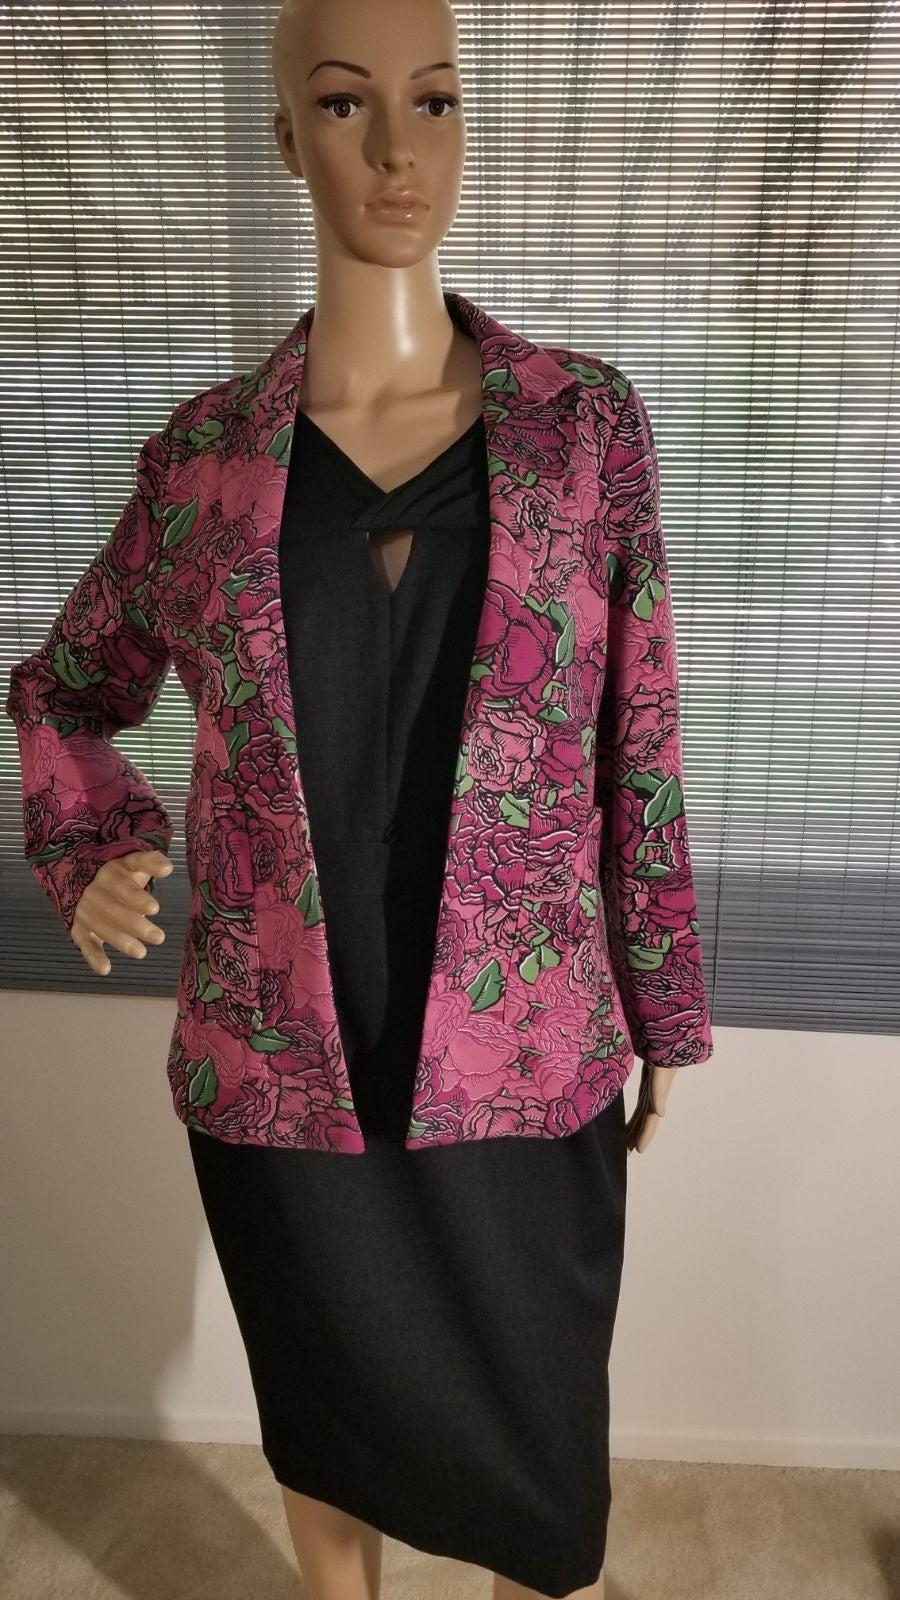 Lularoe blazer pink floral NWOT sz XS